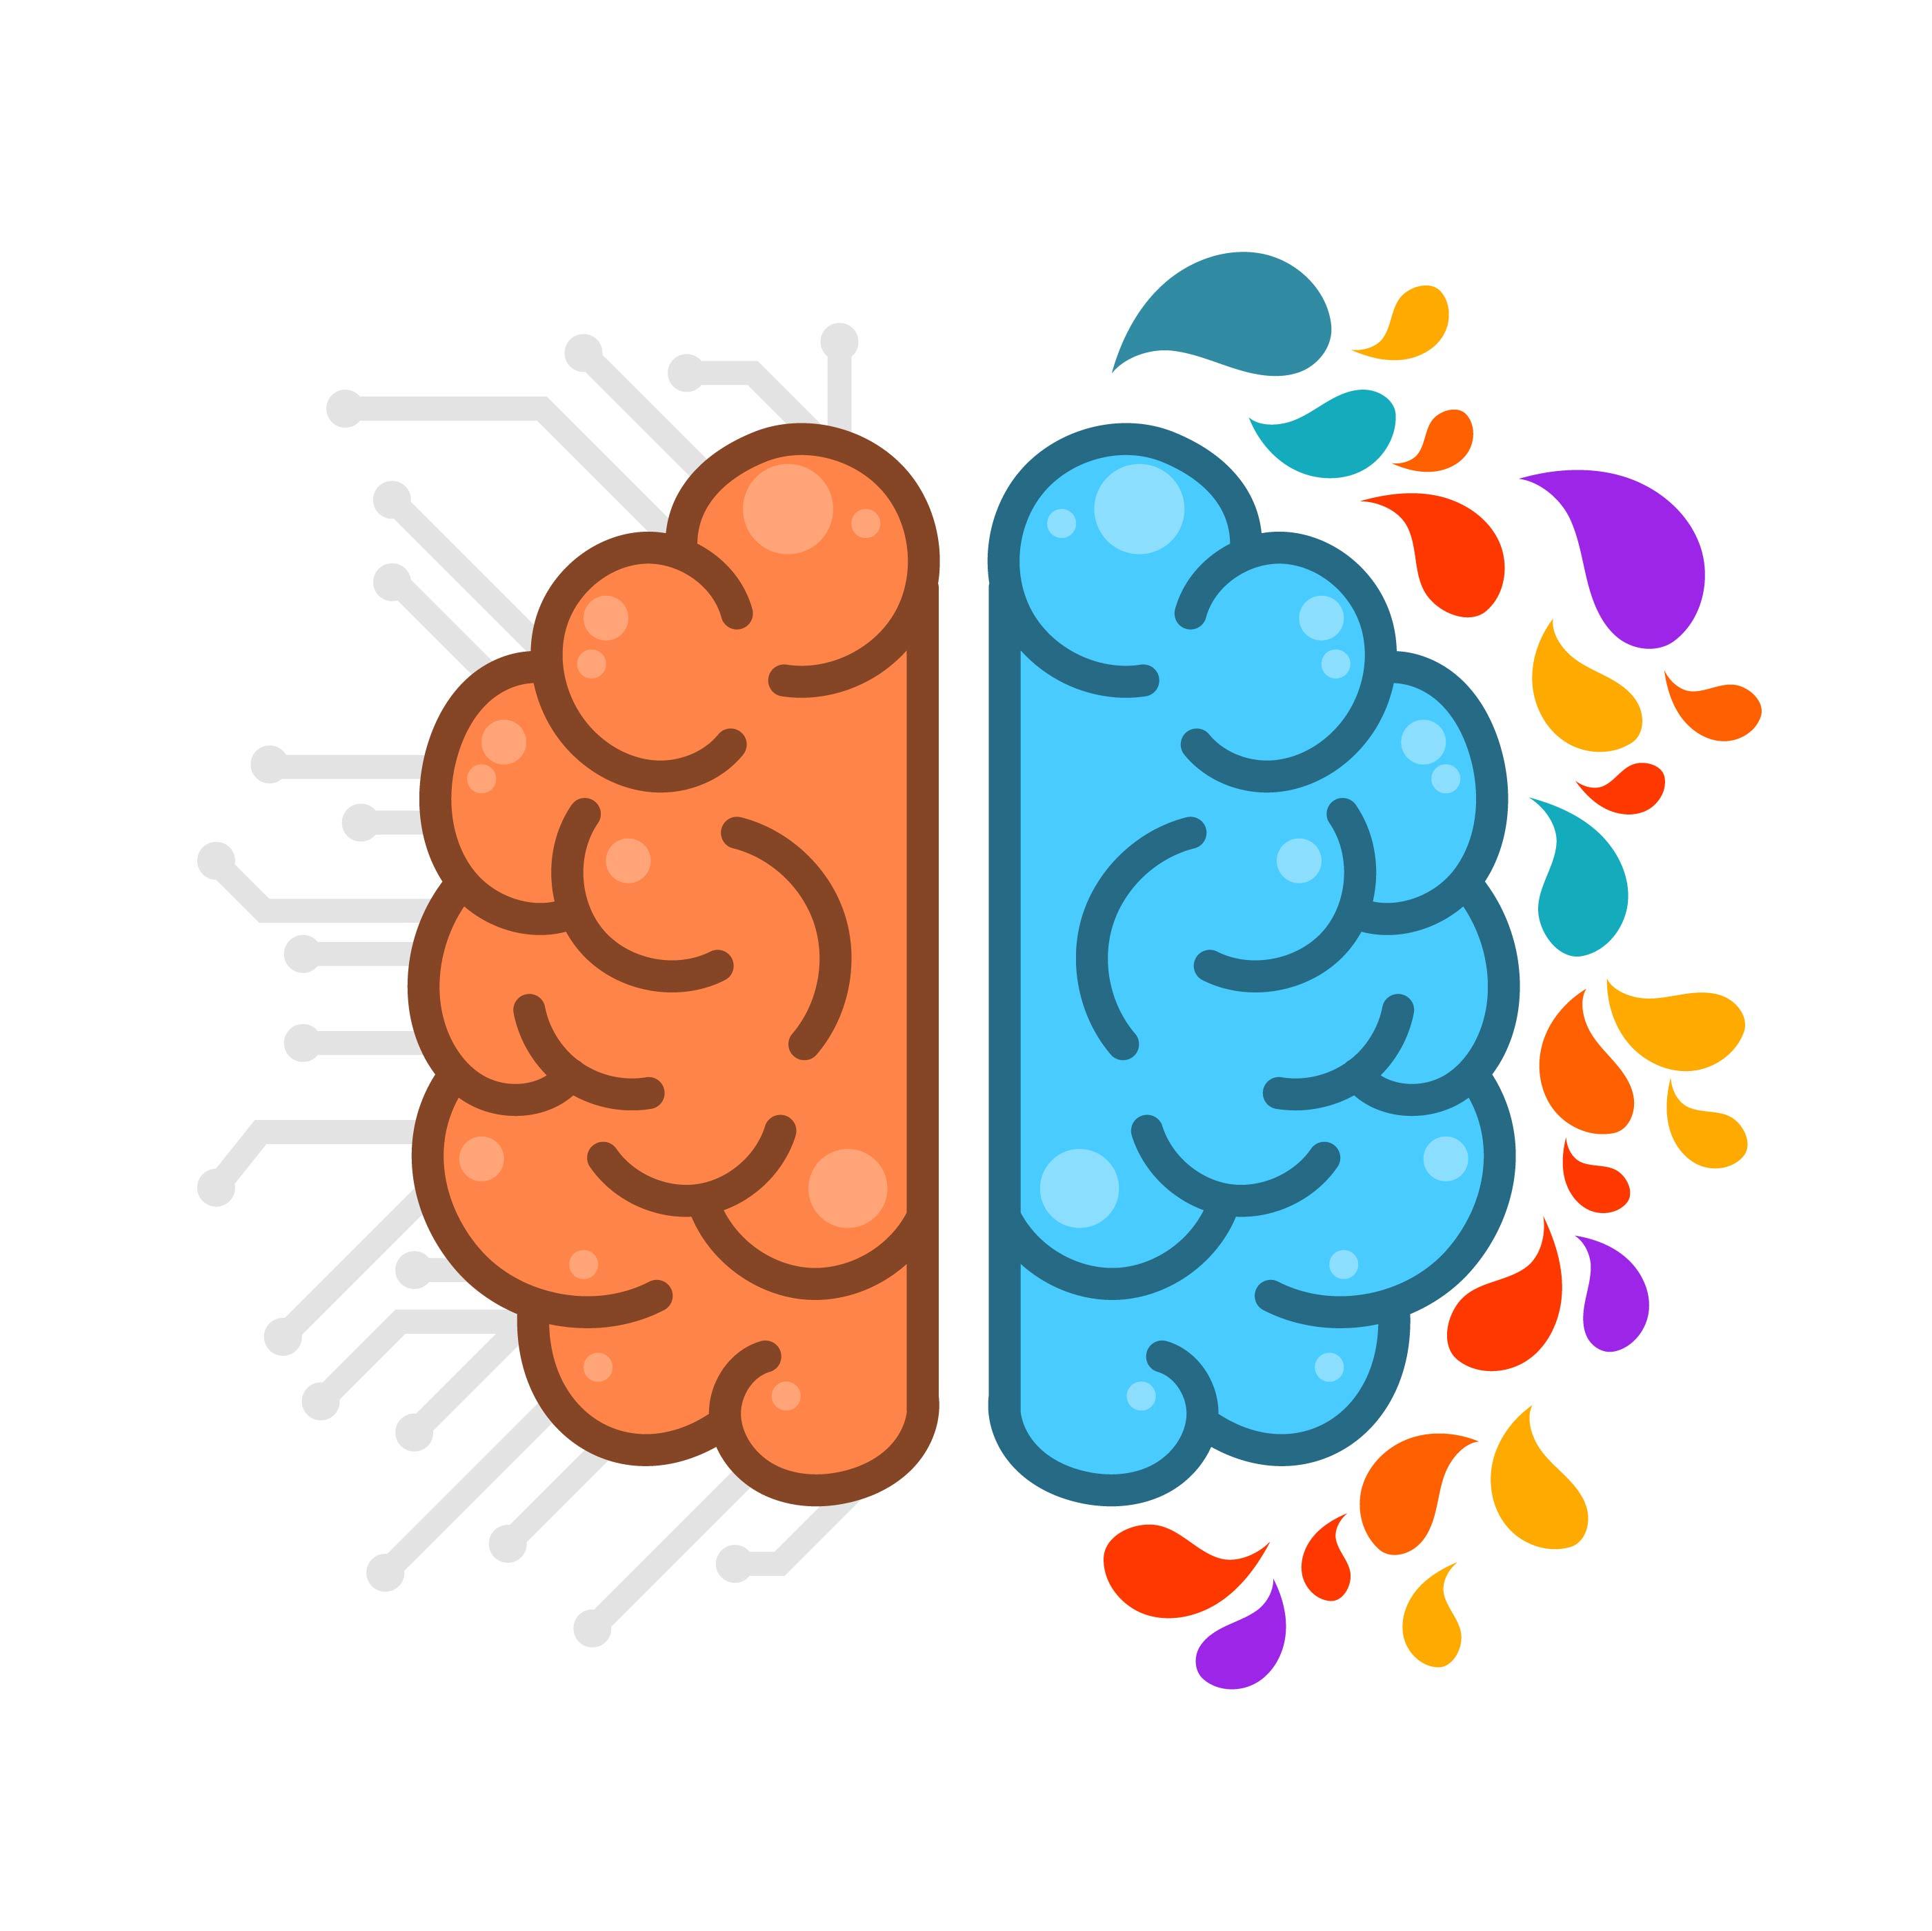 Flat Simple Human Brain HemisPheres - Download Free ...